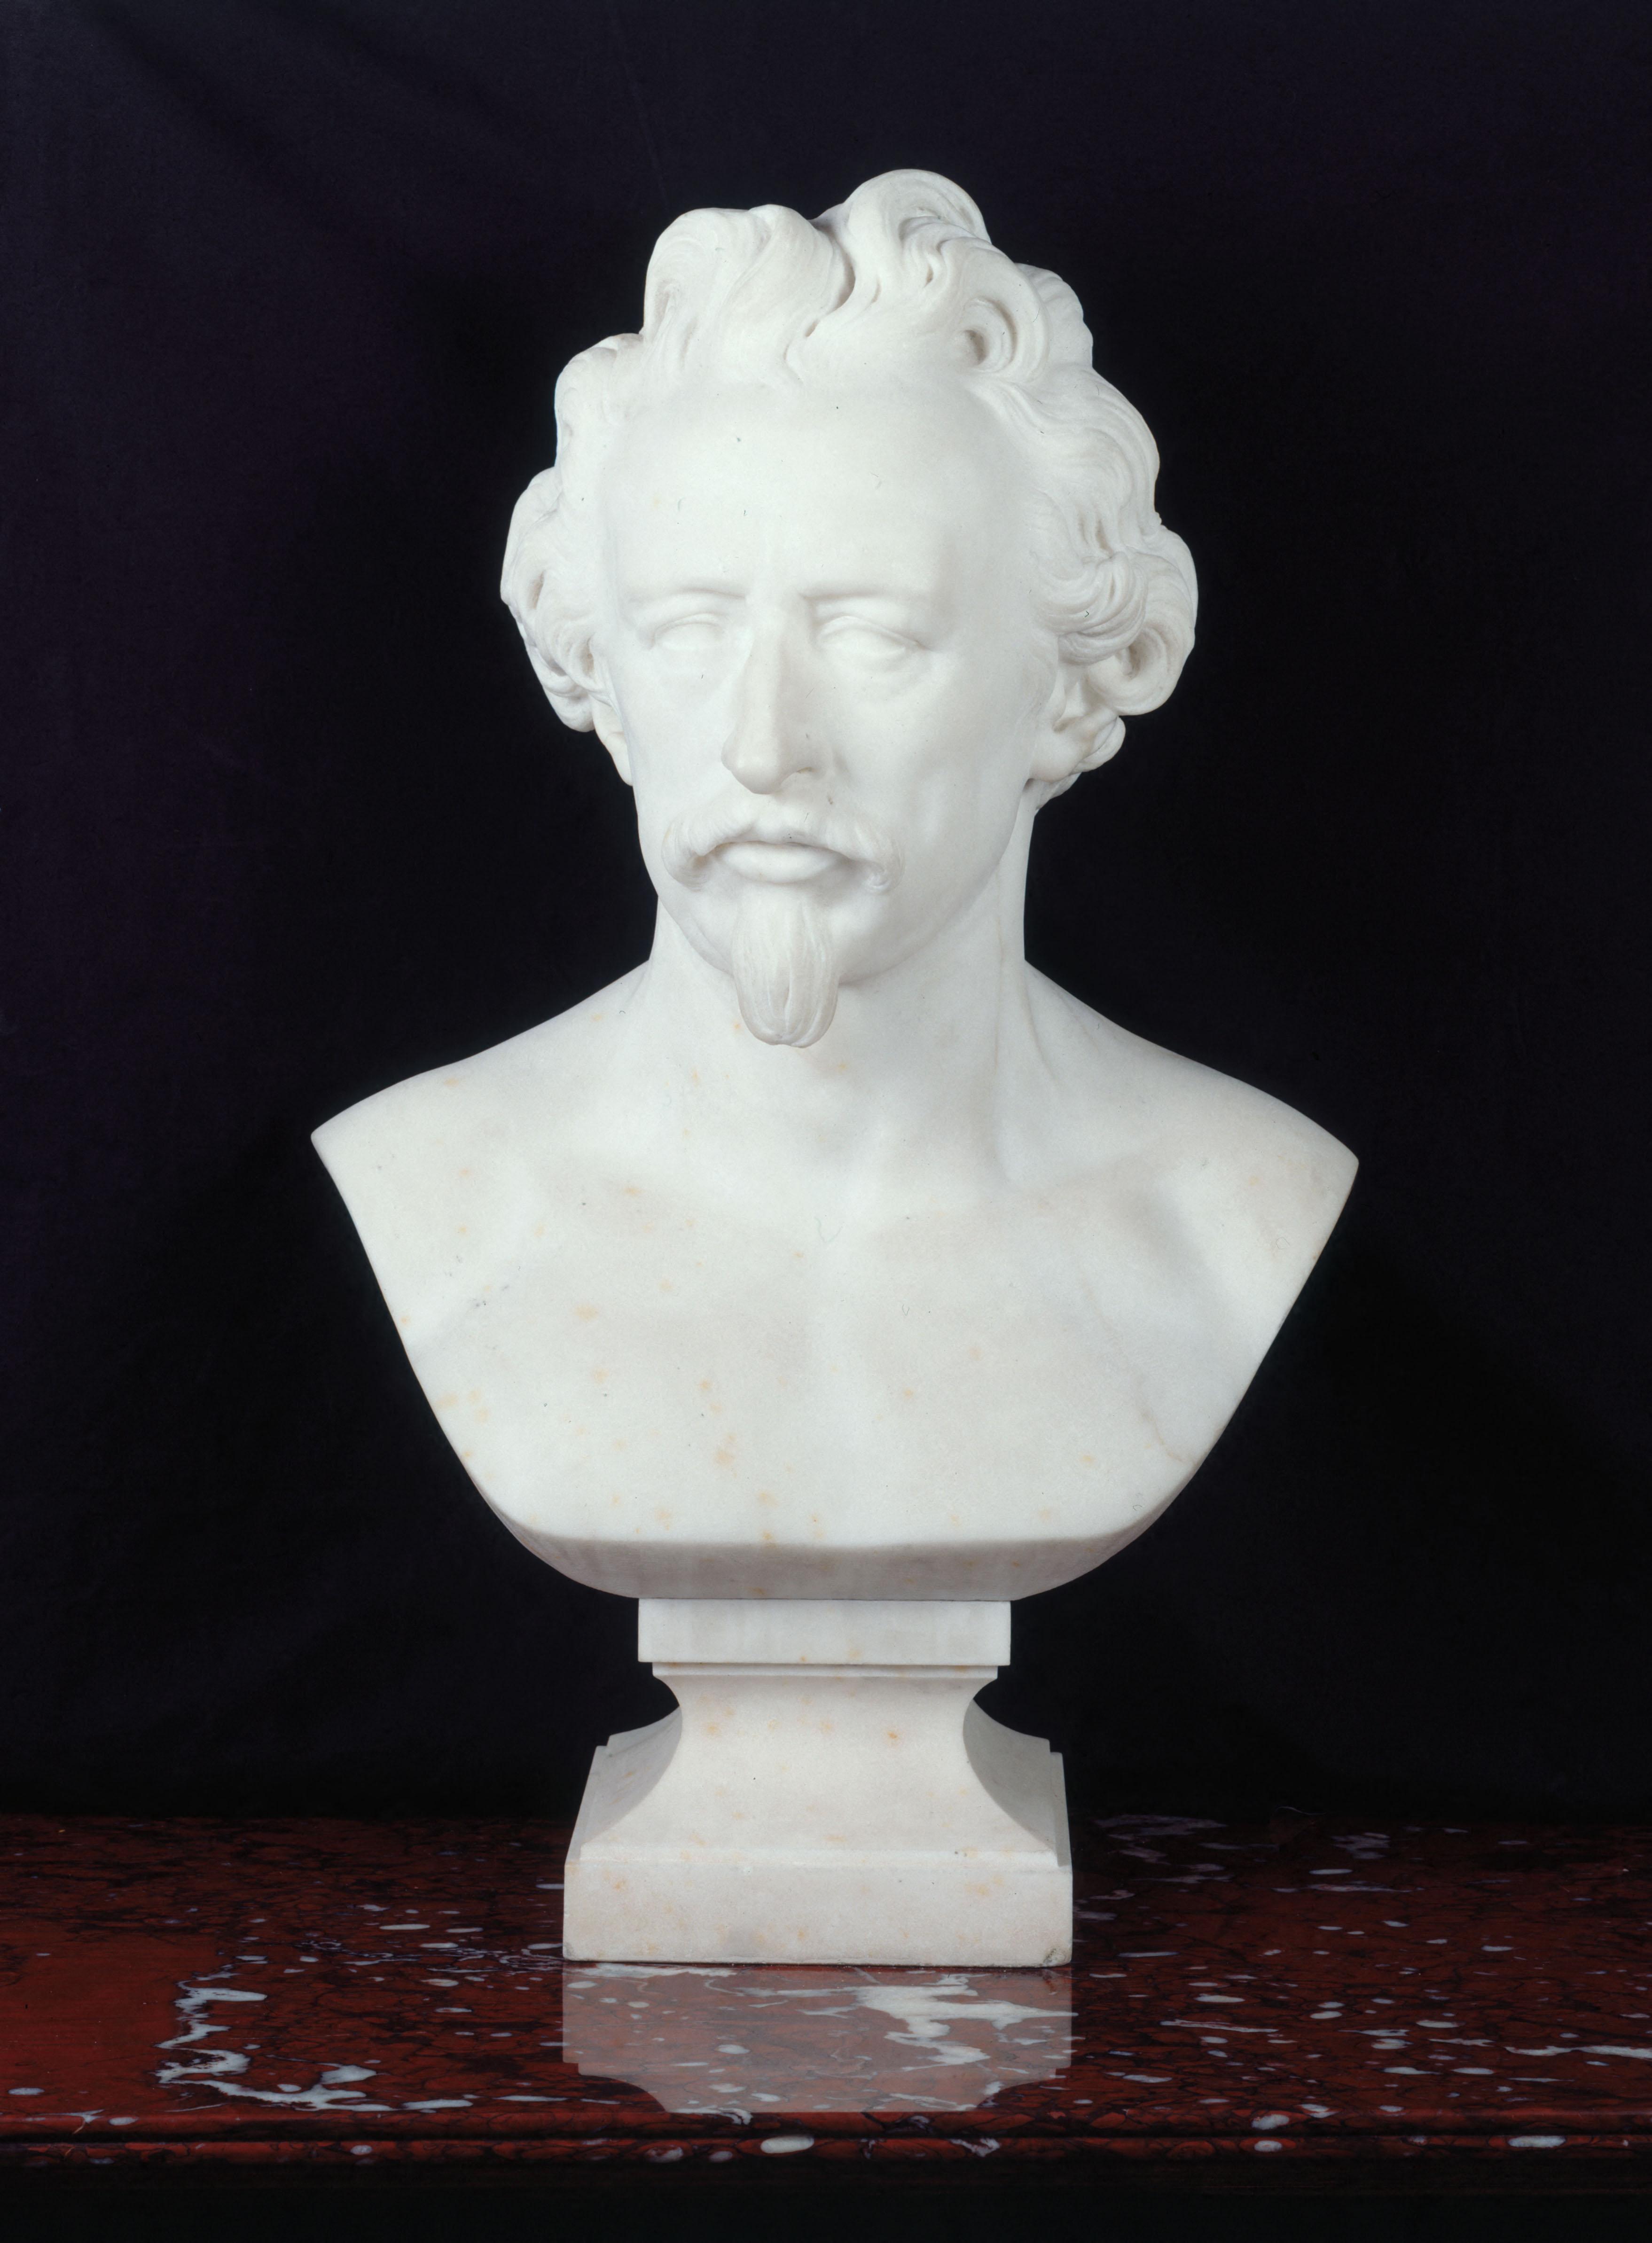 Buste d'Ary Scheffer, Pierre-Jules Cavelier